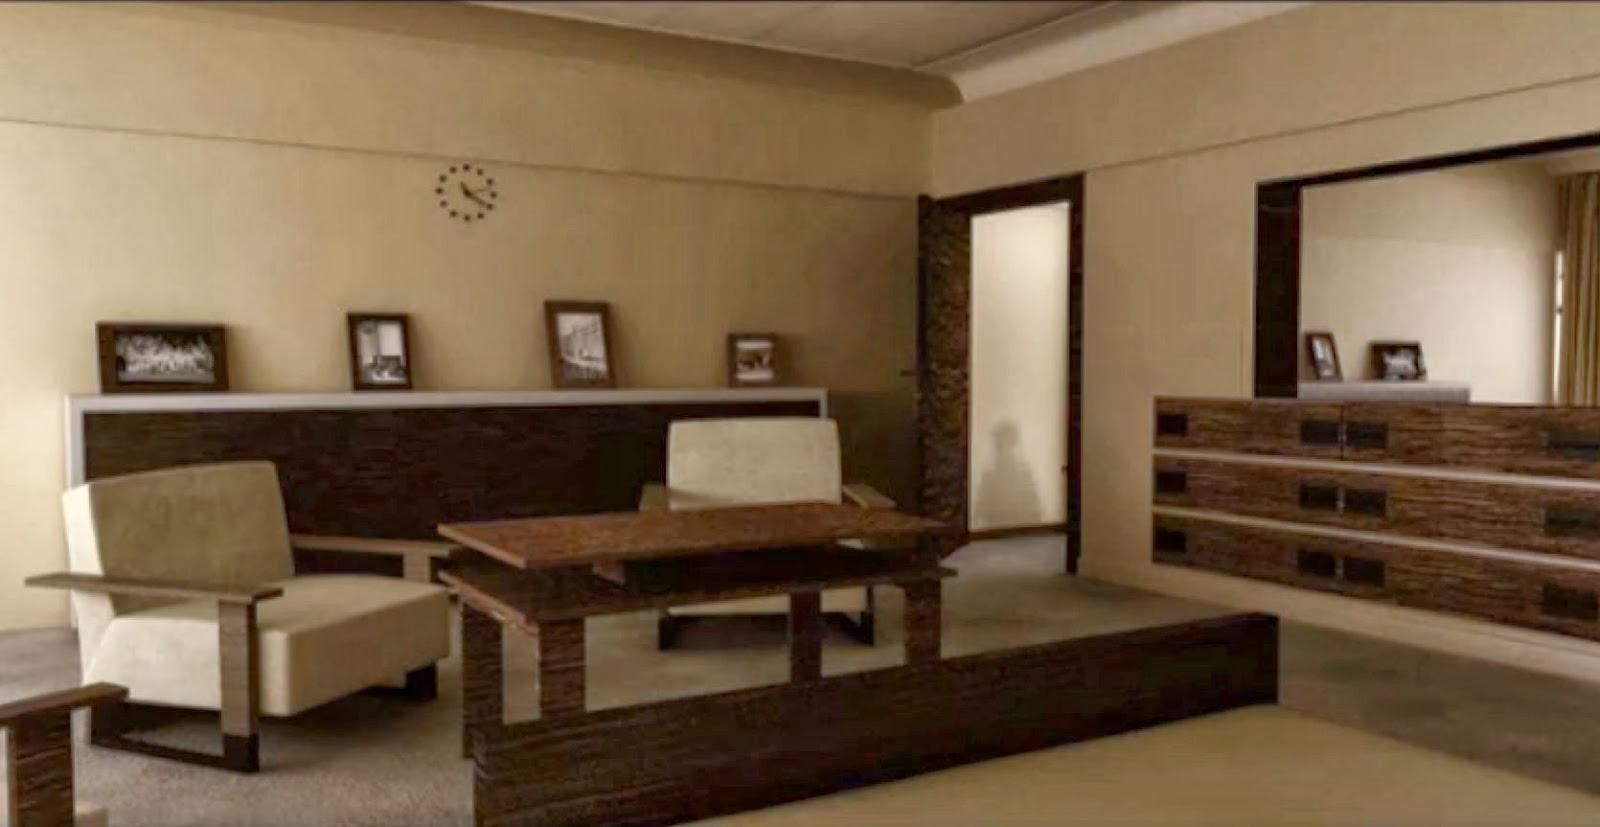 le blog des amis de la villa cavrois la chambre des parents. Black Bedroom Furniture Sets. Home Design Ideas